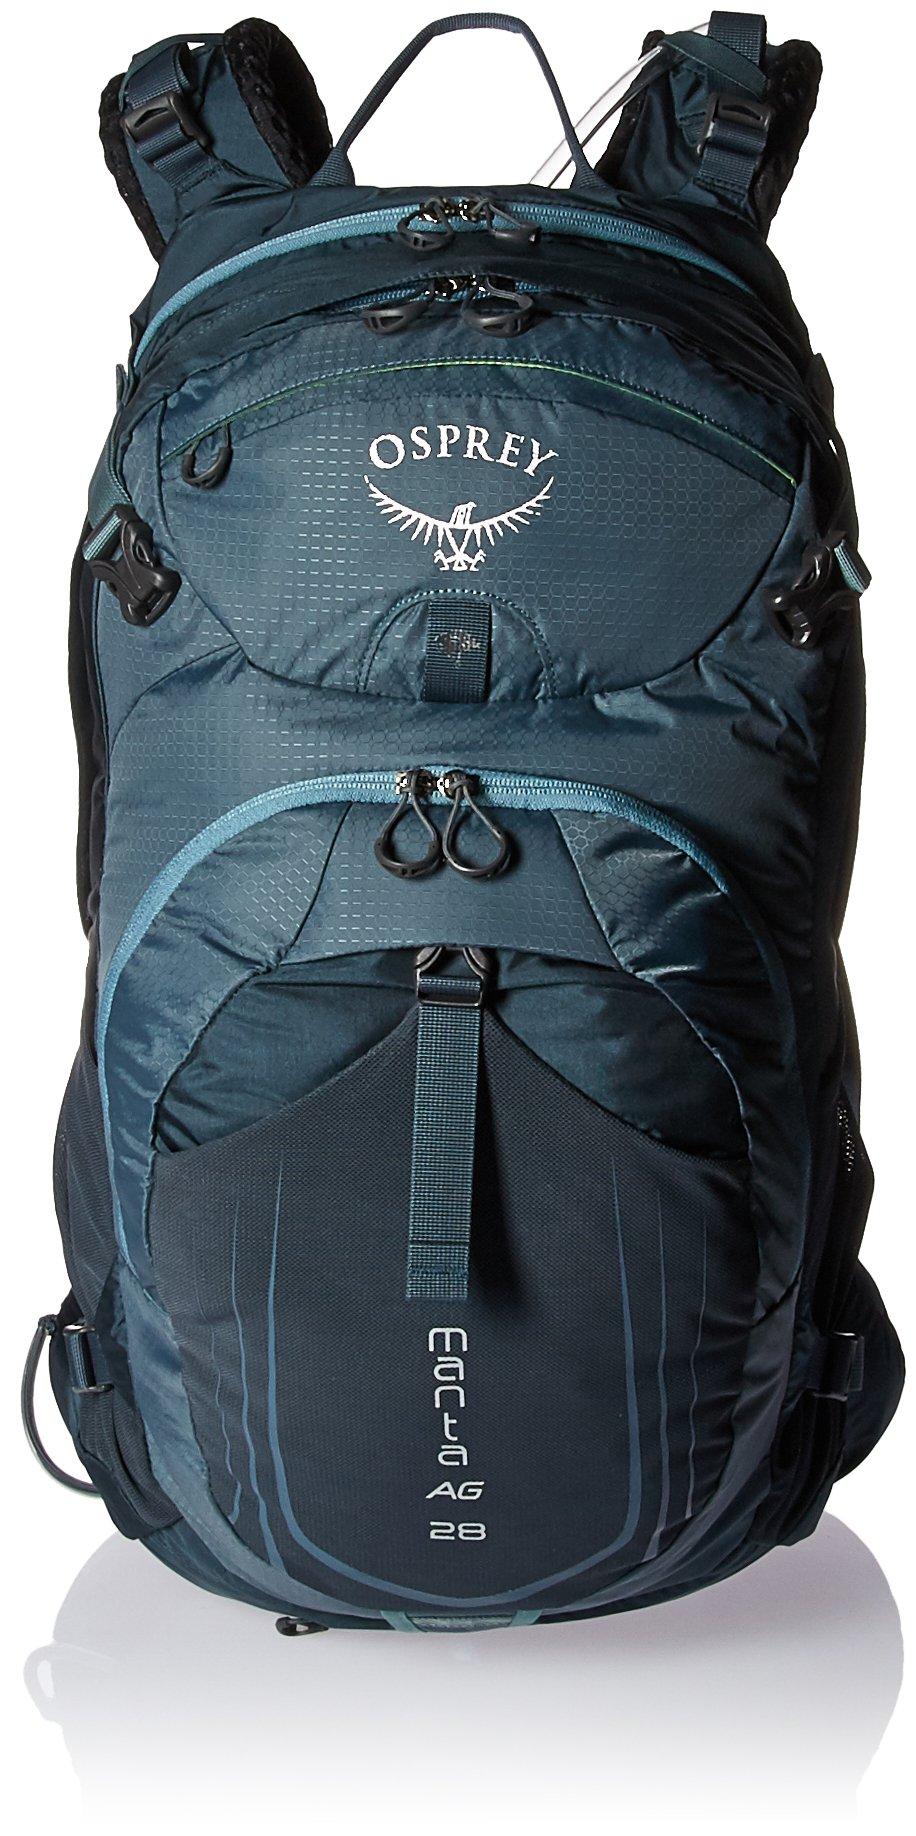 Osprey Packs Manta AG 28 Hydration Pack, Fossil Grey, Small/Medium